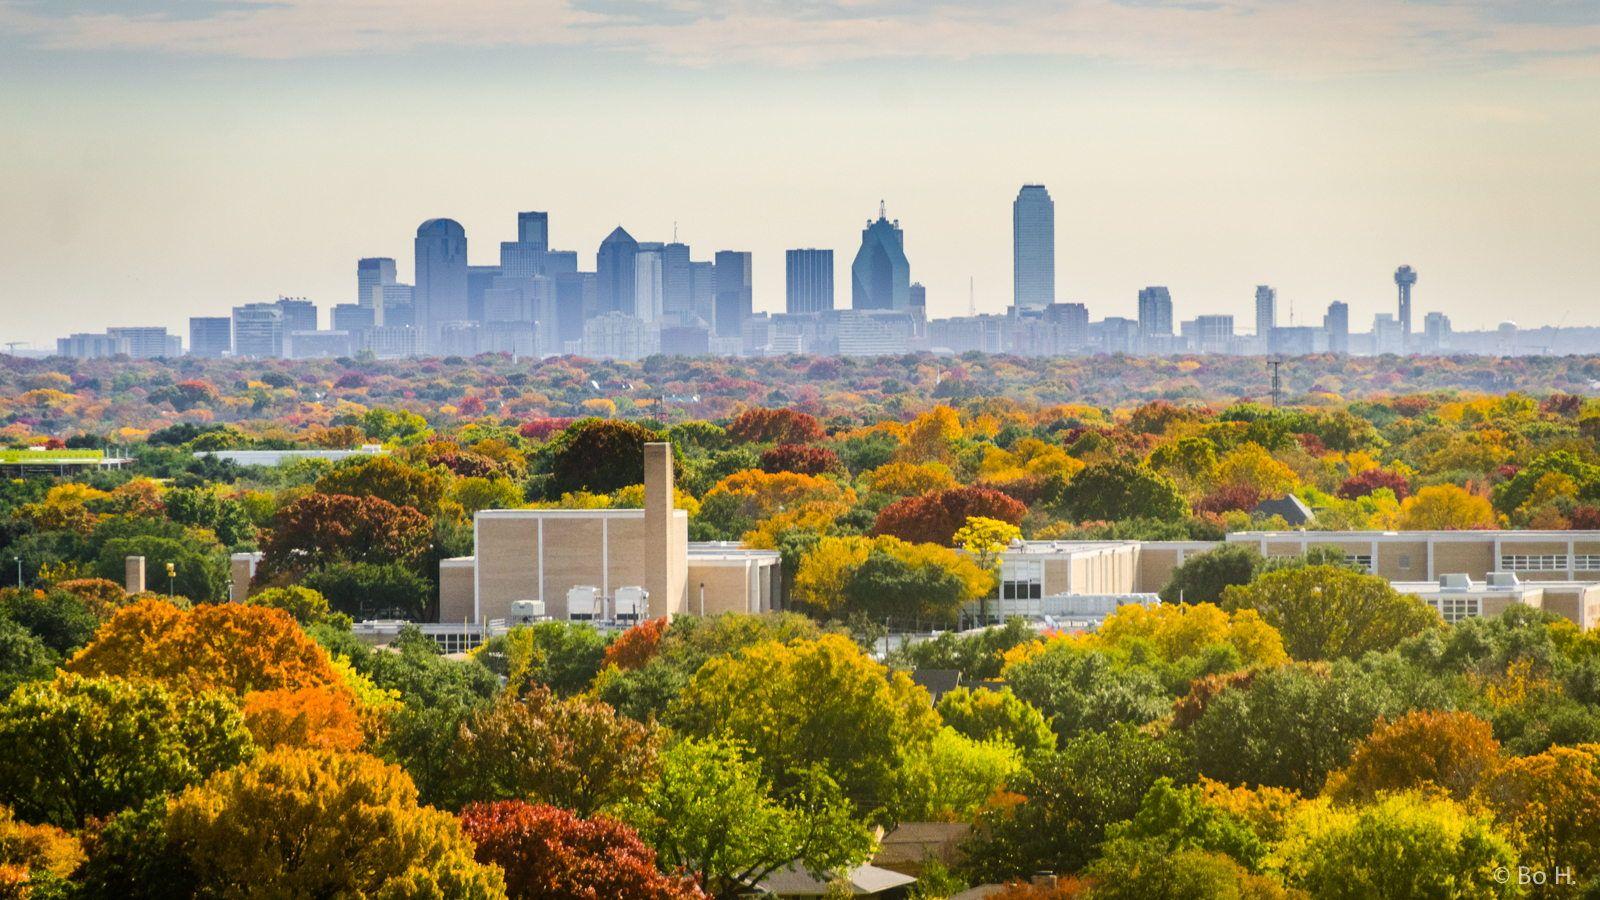 Dallas Skyline Colorfall Dallas skyline, Dallas, Skyline